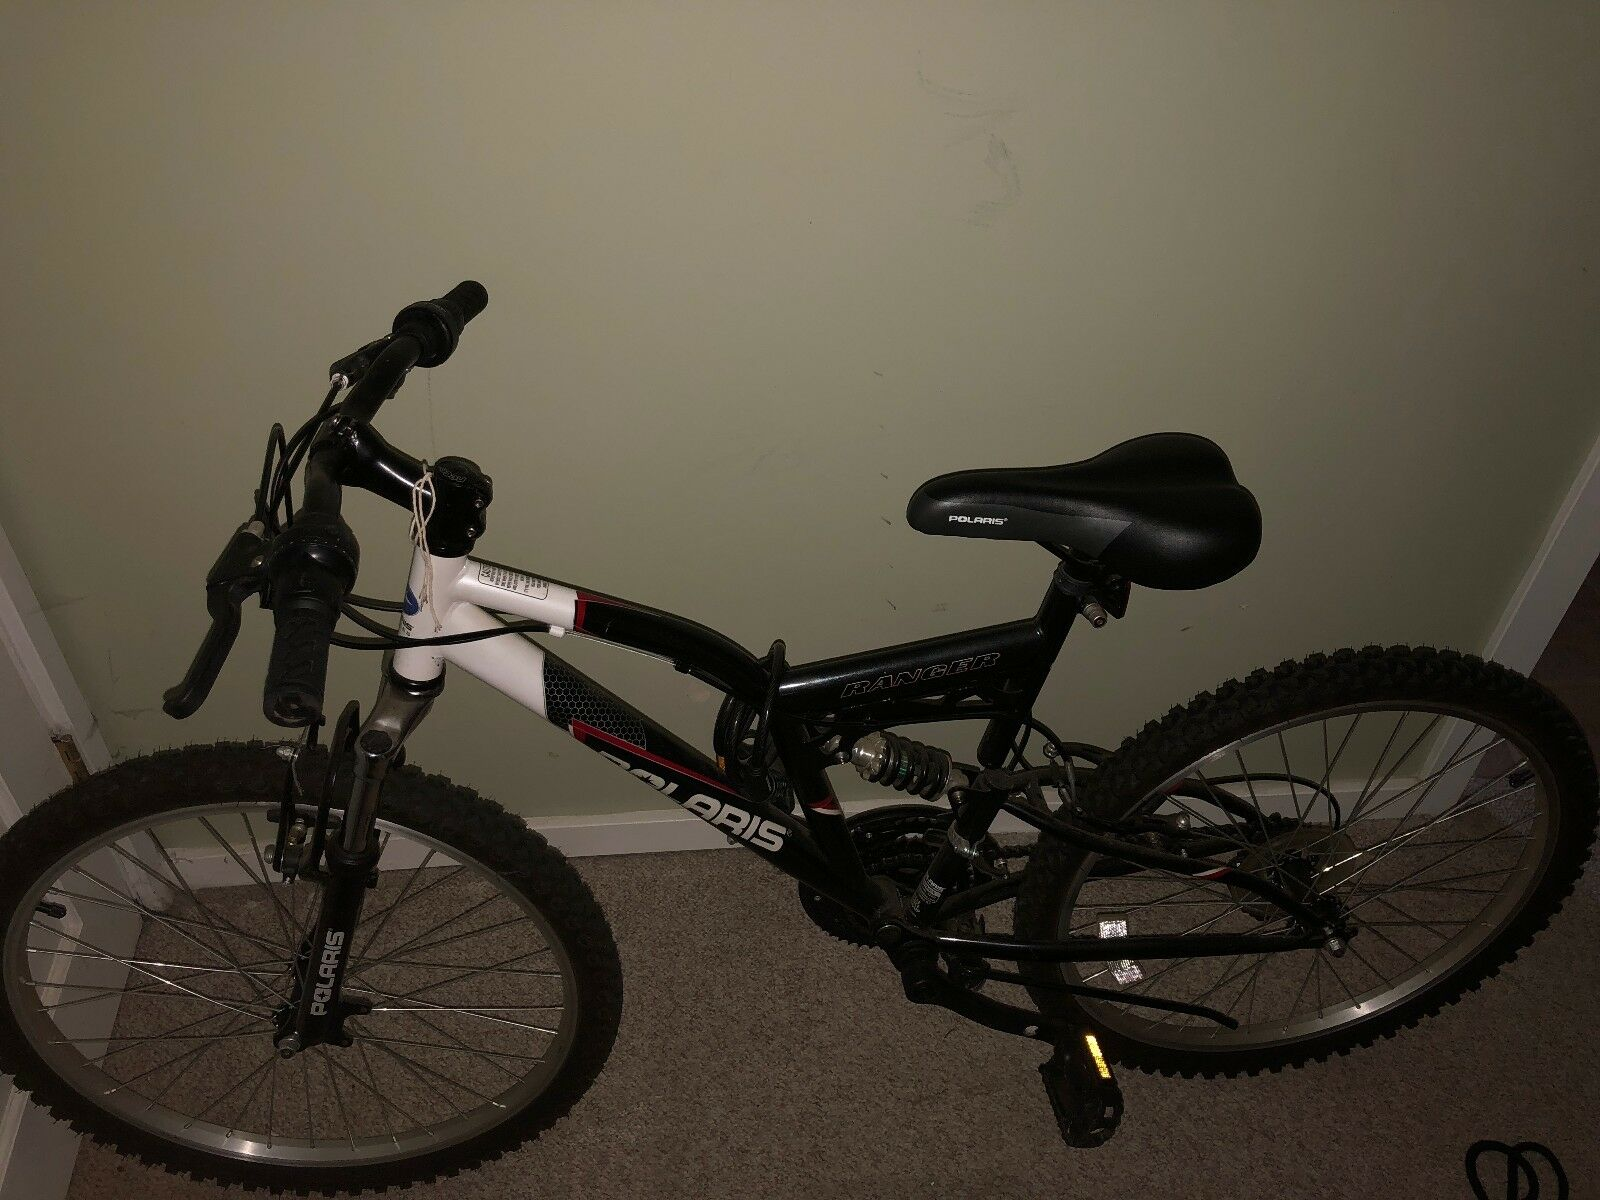 Polaris Ranger Full Suspension Mountain Bike, 24 inch Wheels, 17 inch Frame,